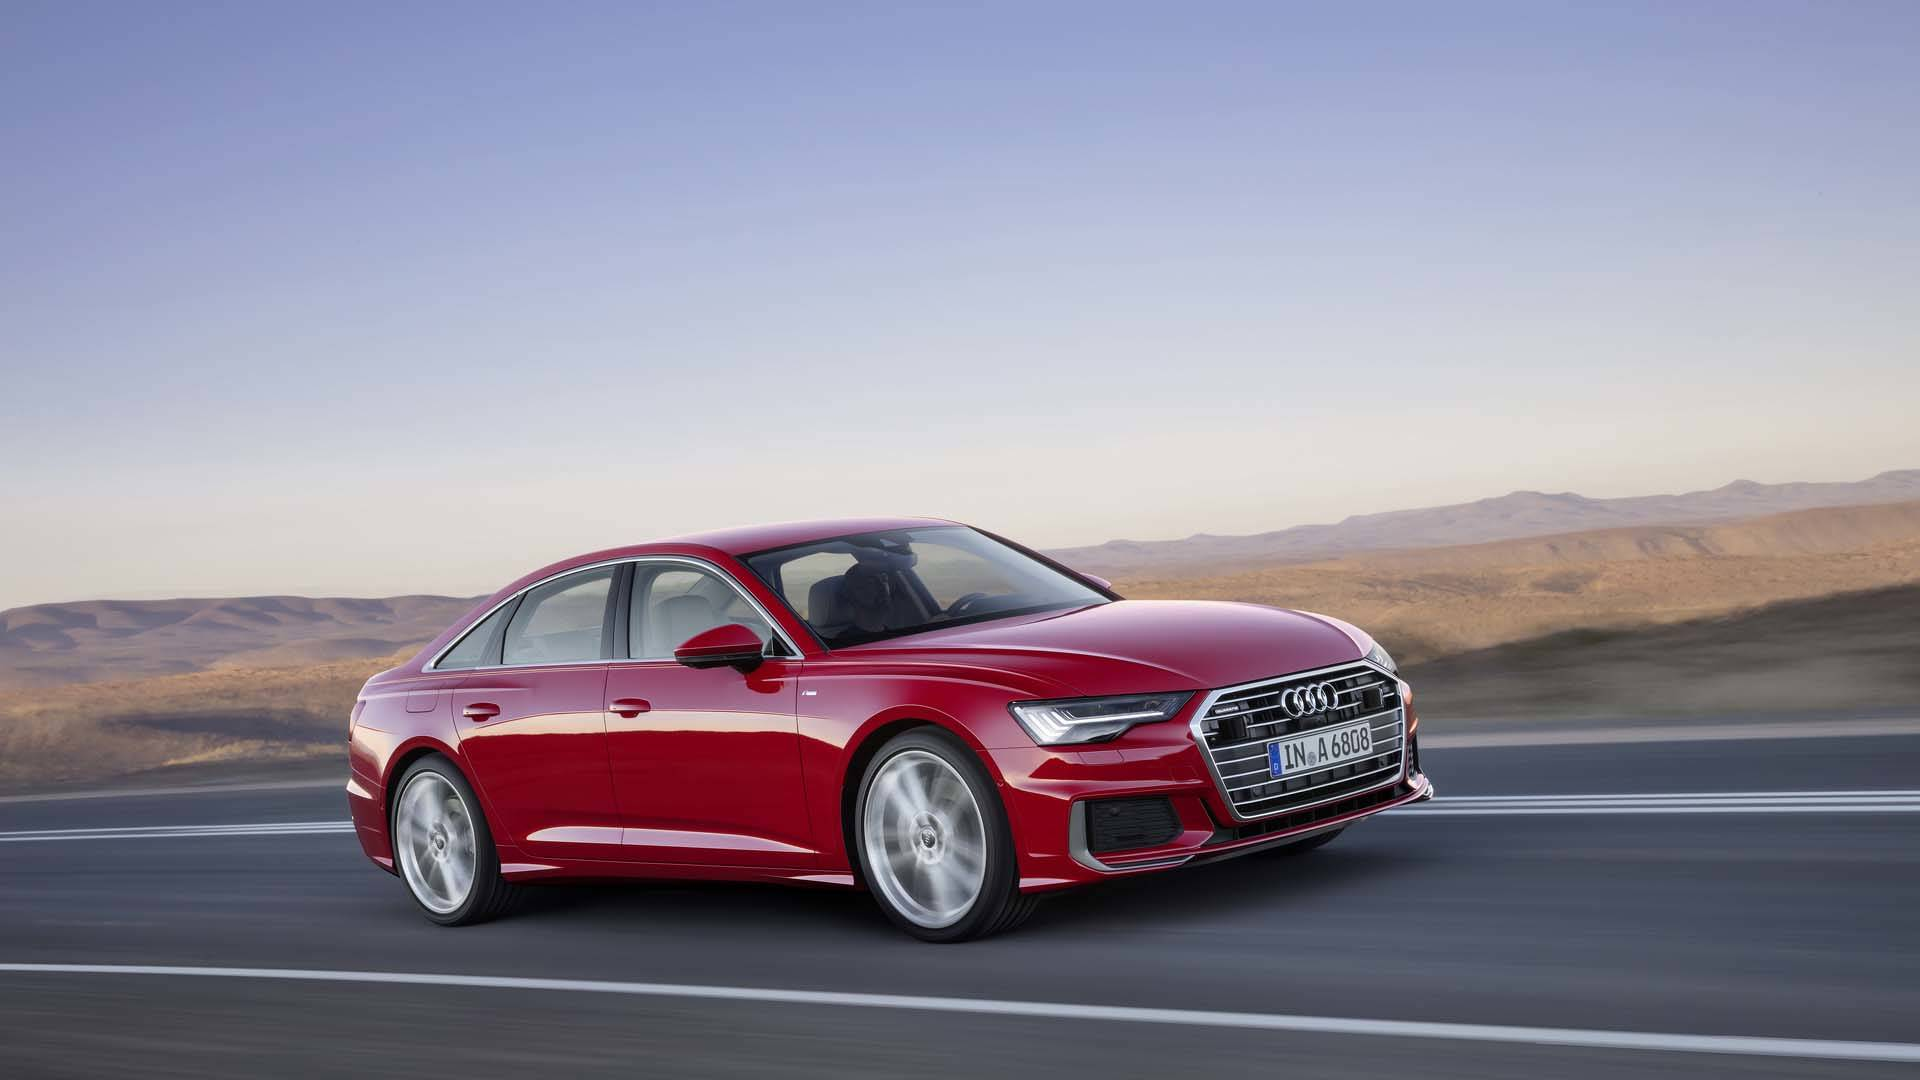 VW će definitivno sahraniti dizel: Audi obustavio isporuke modela A6 i A7 koje pogoni V6 agregat